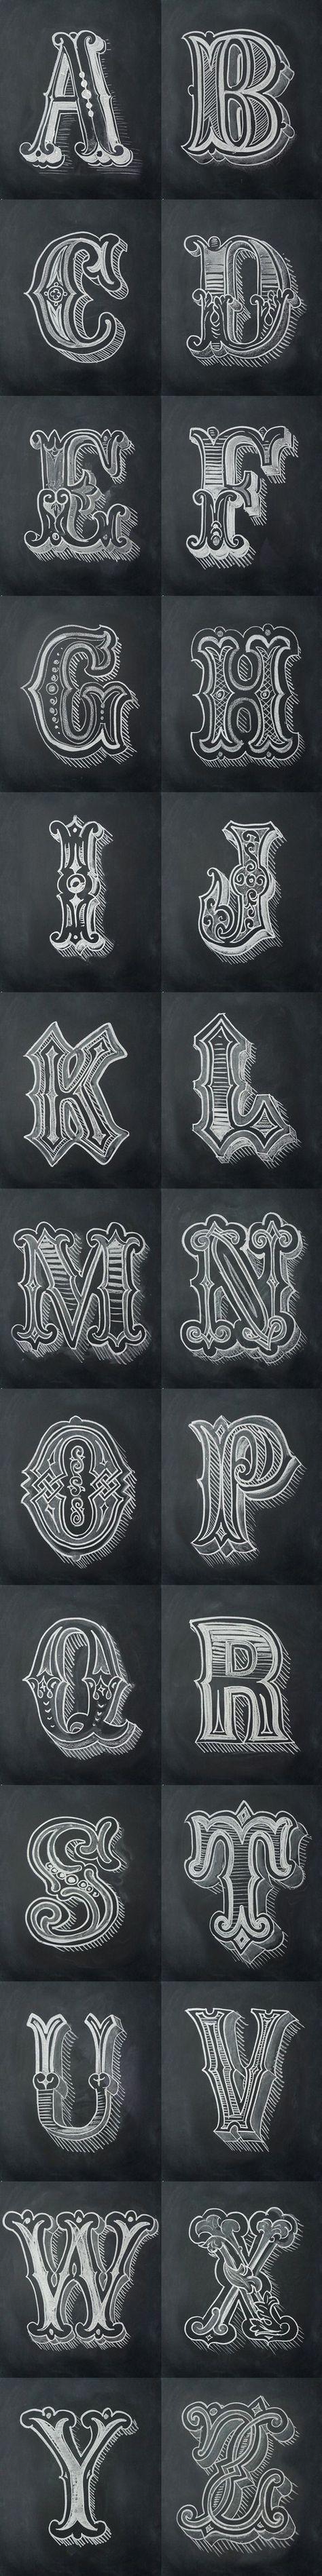 Chalk Alphabet by Antonio Rodrigues Jr #Art #Chalkboard